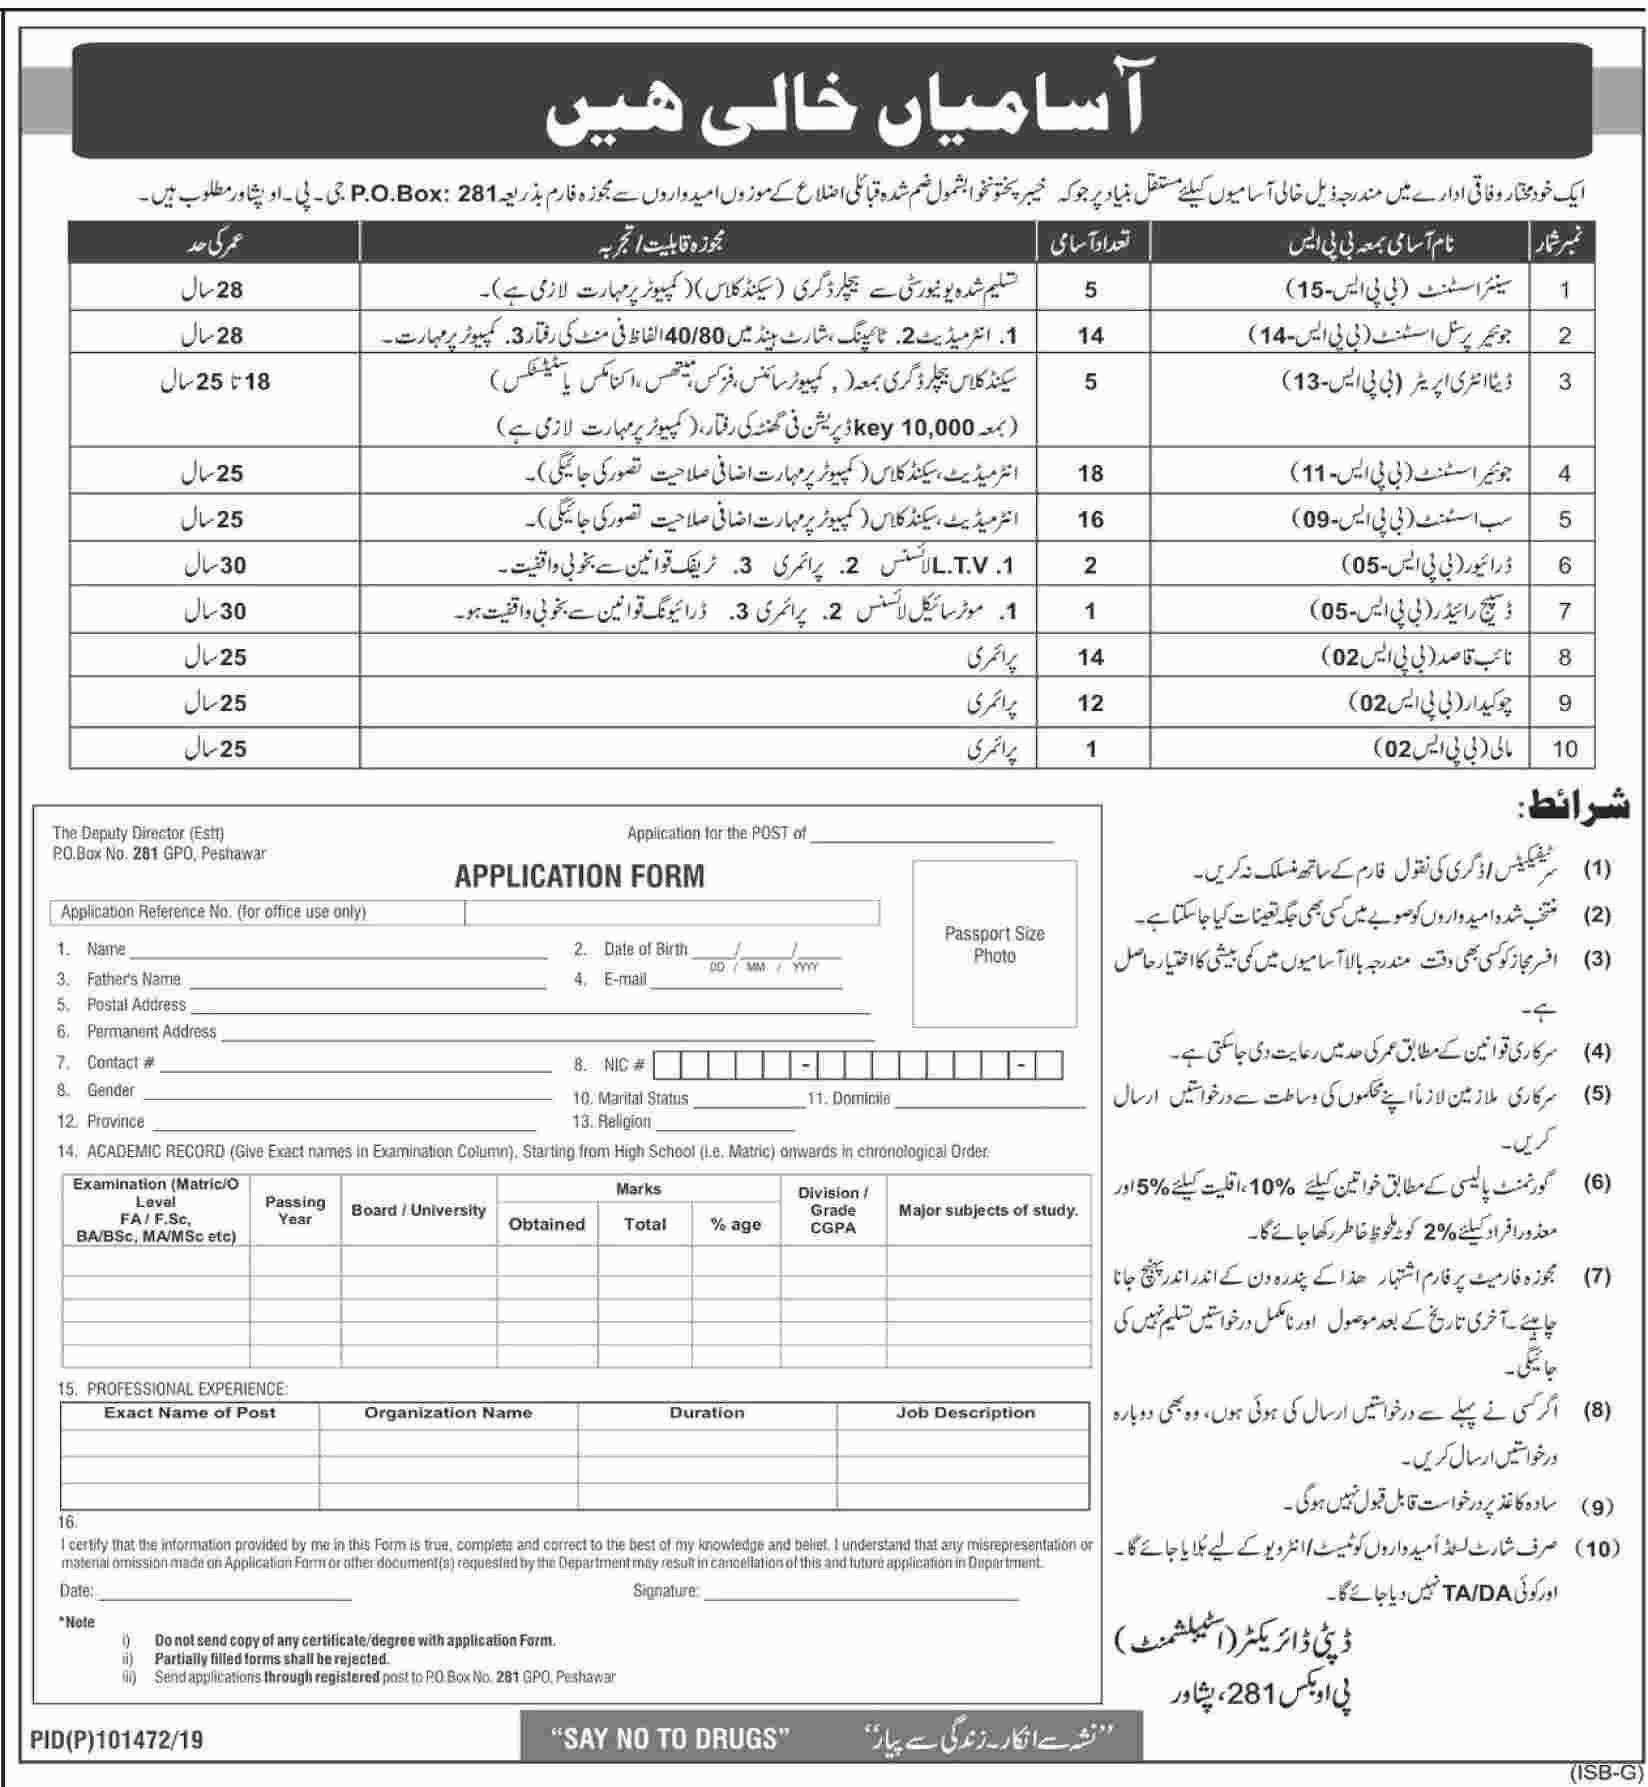 Public Sector Organization KPK Jobs 2019 for Assistants